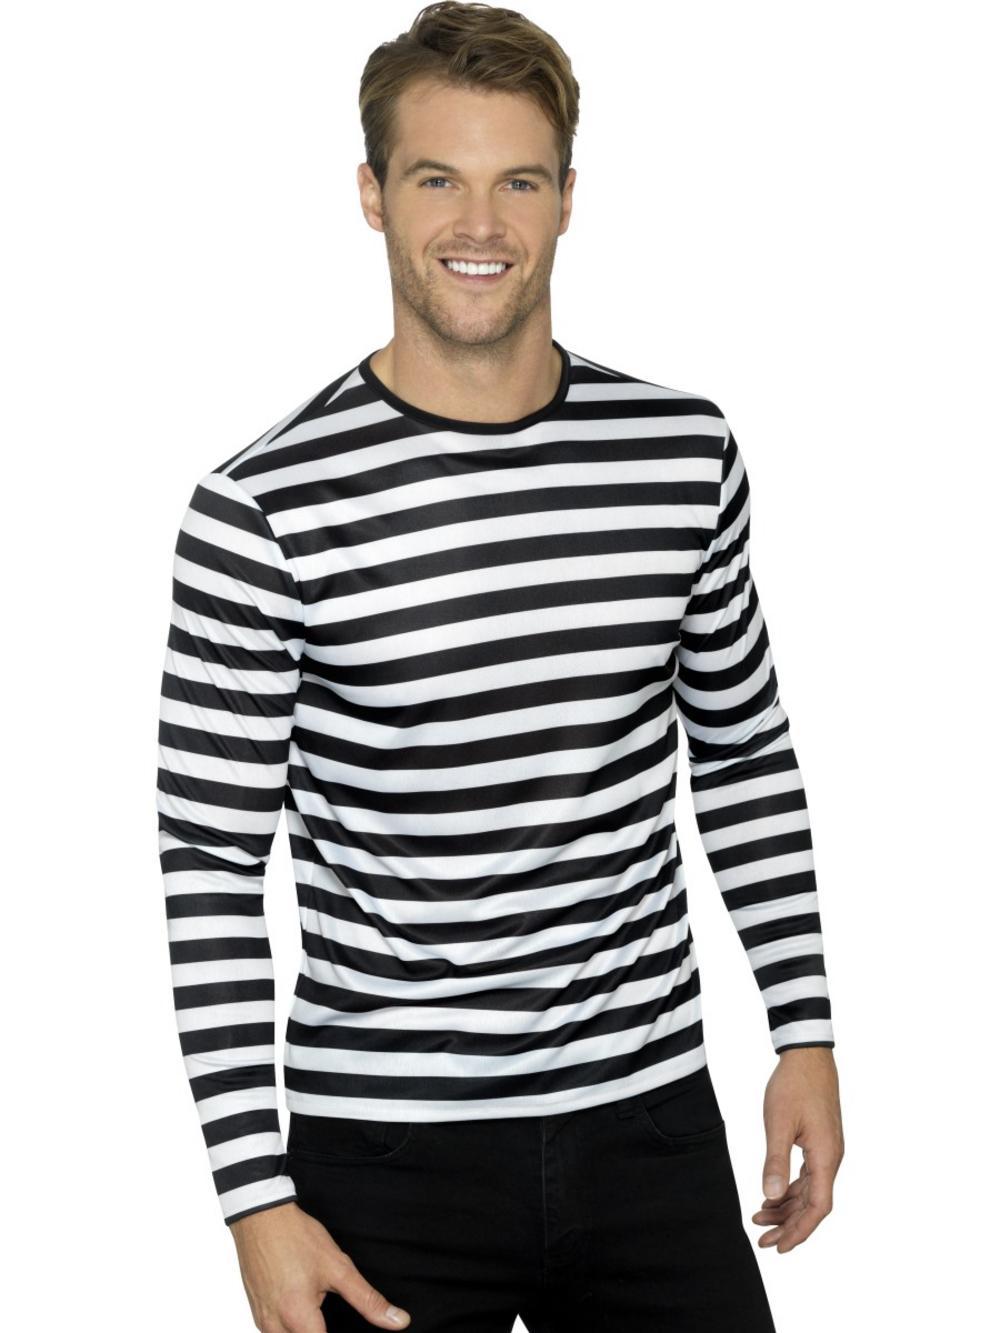 Stripy T-Shirt Black & White